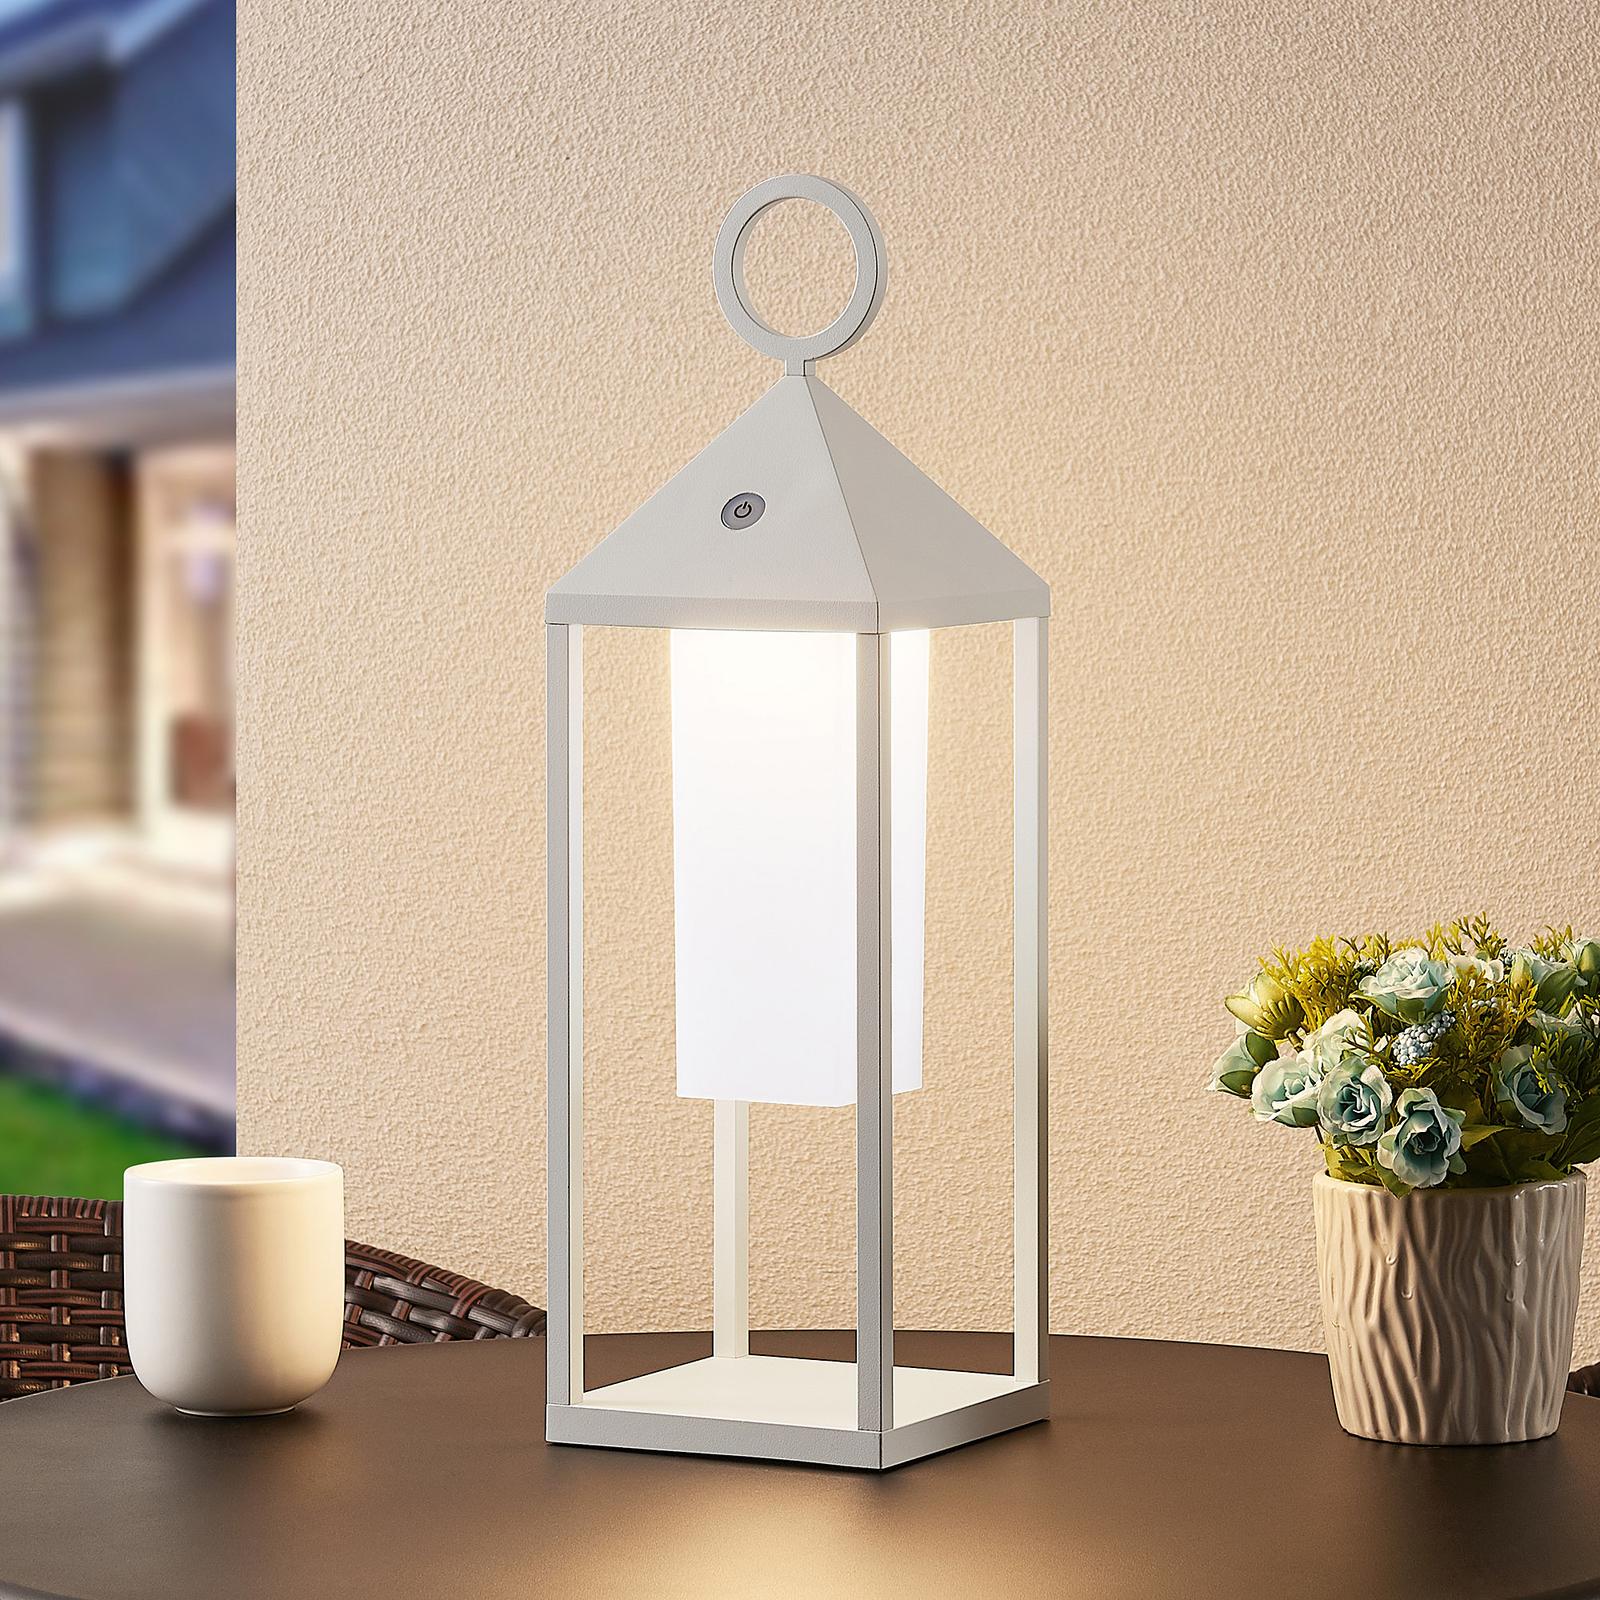 Lucande Miluma LED venkovní lucerna, 54 cm, bílá